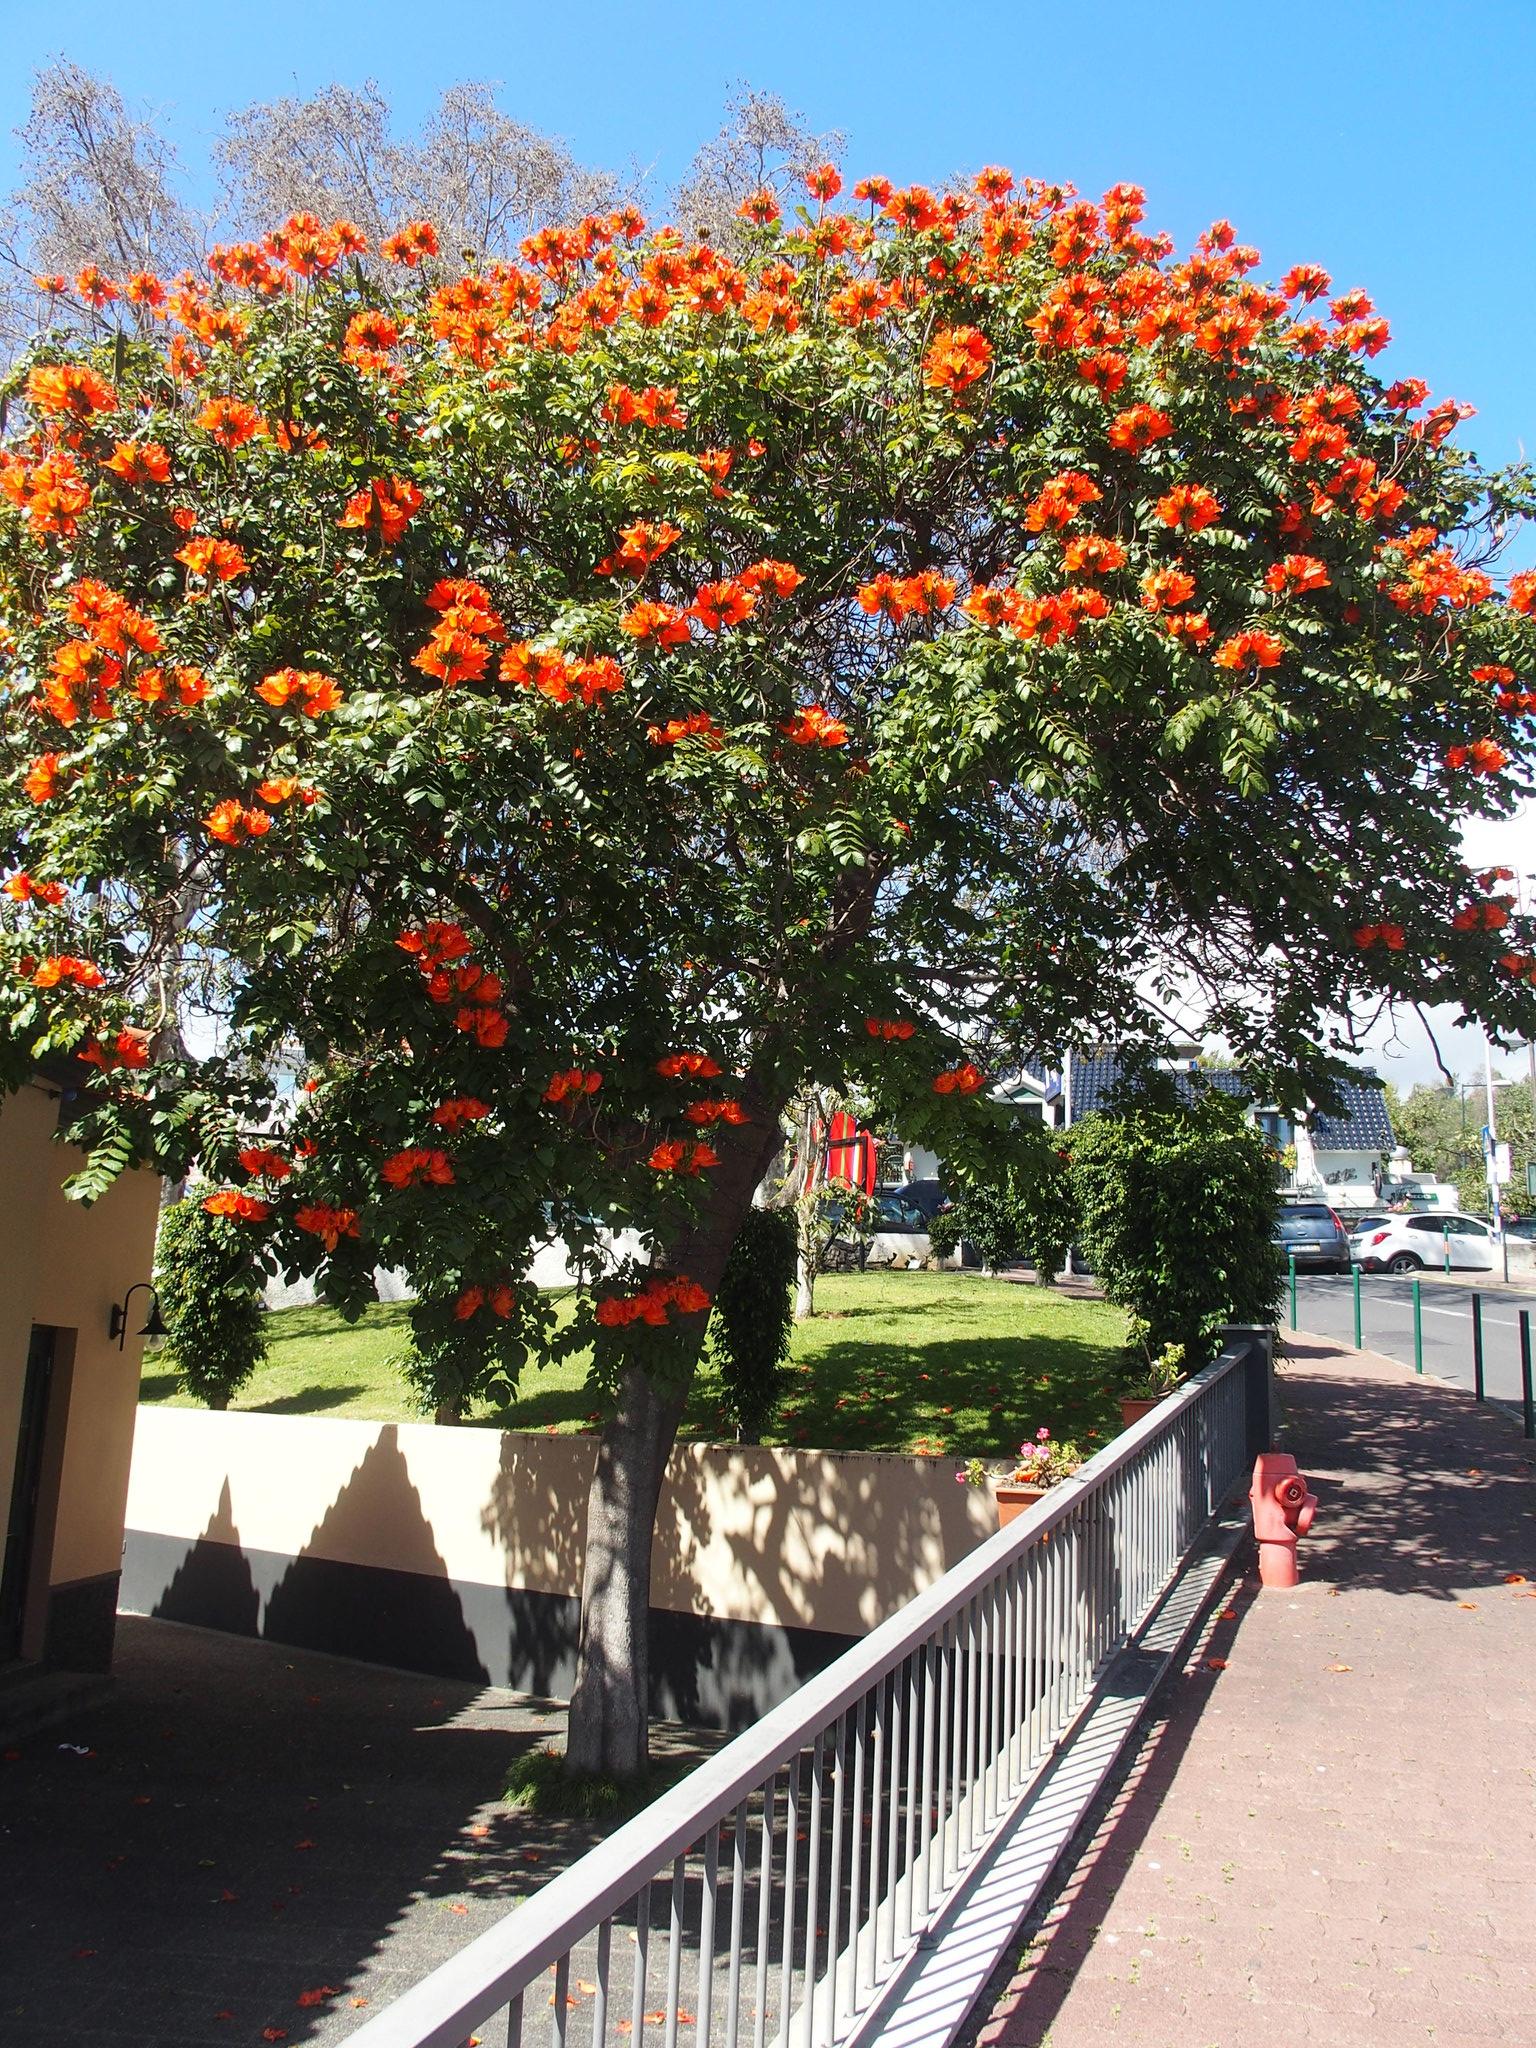 Vid hotellet - Tulpanträd